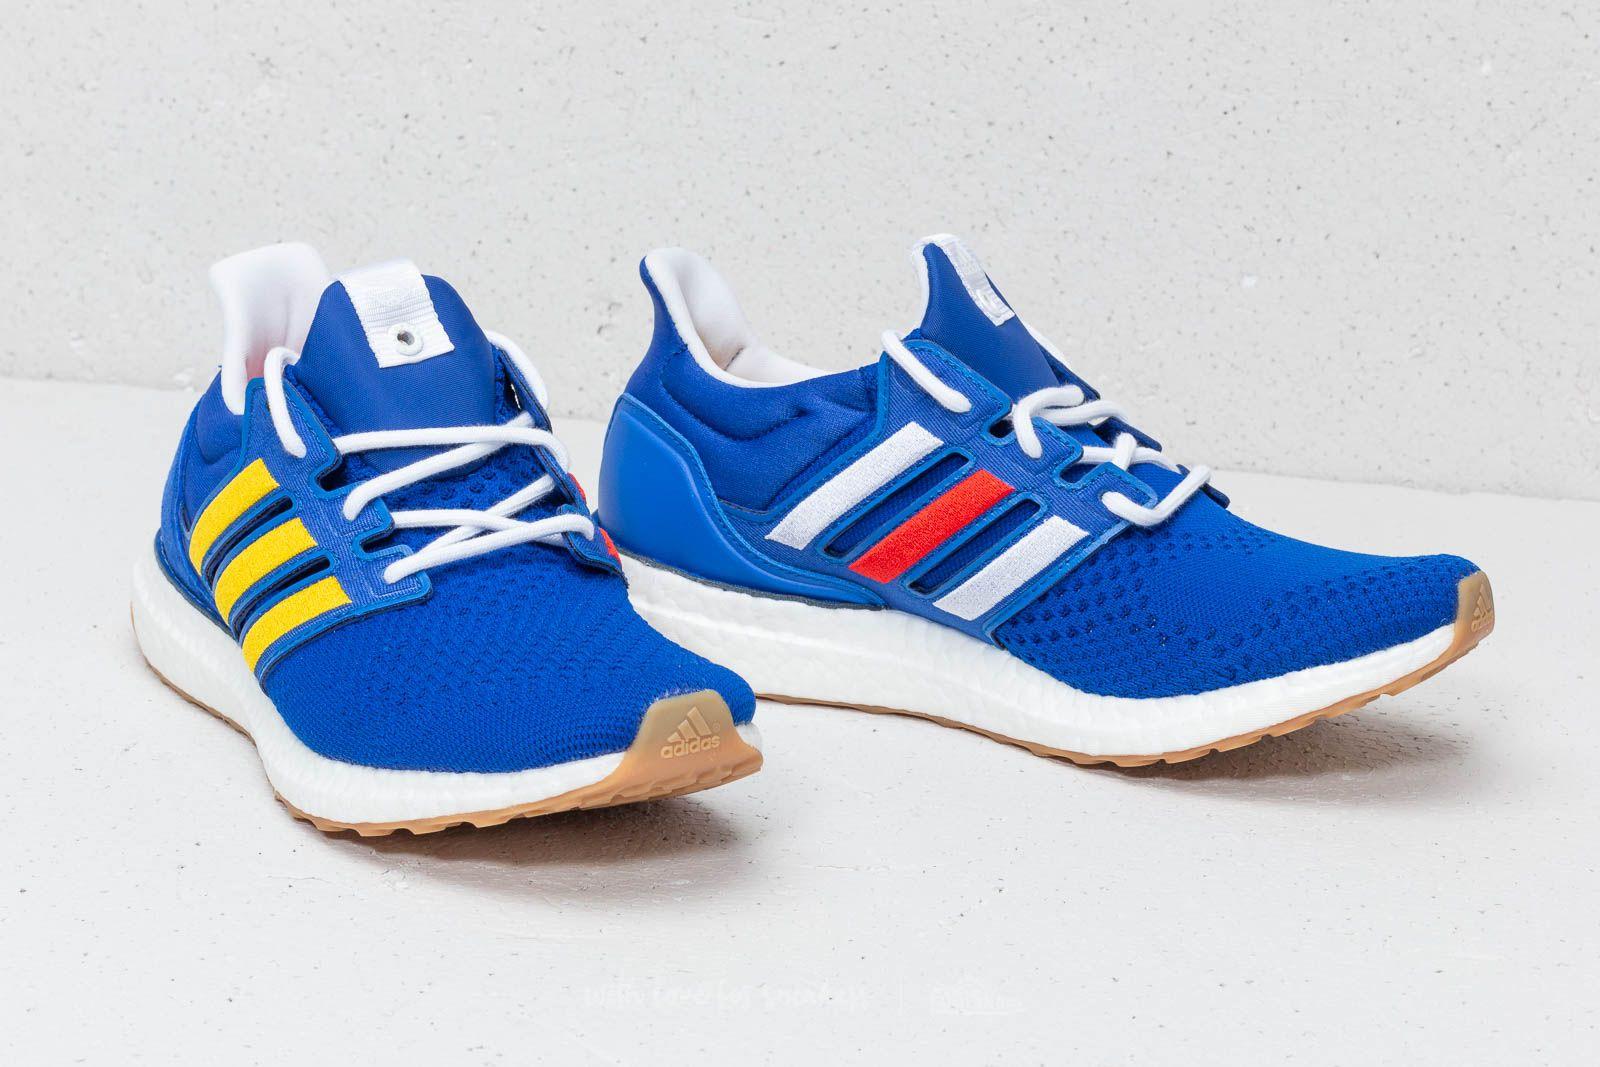 finest selection 07021 65c37 adidas Consortium x Engineered Garments Ultra Boost Blue ...